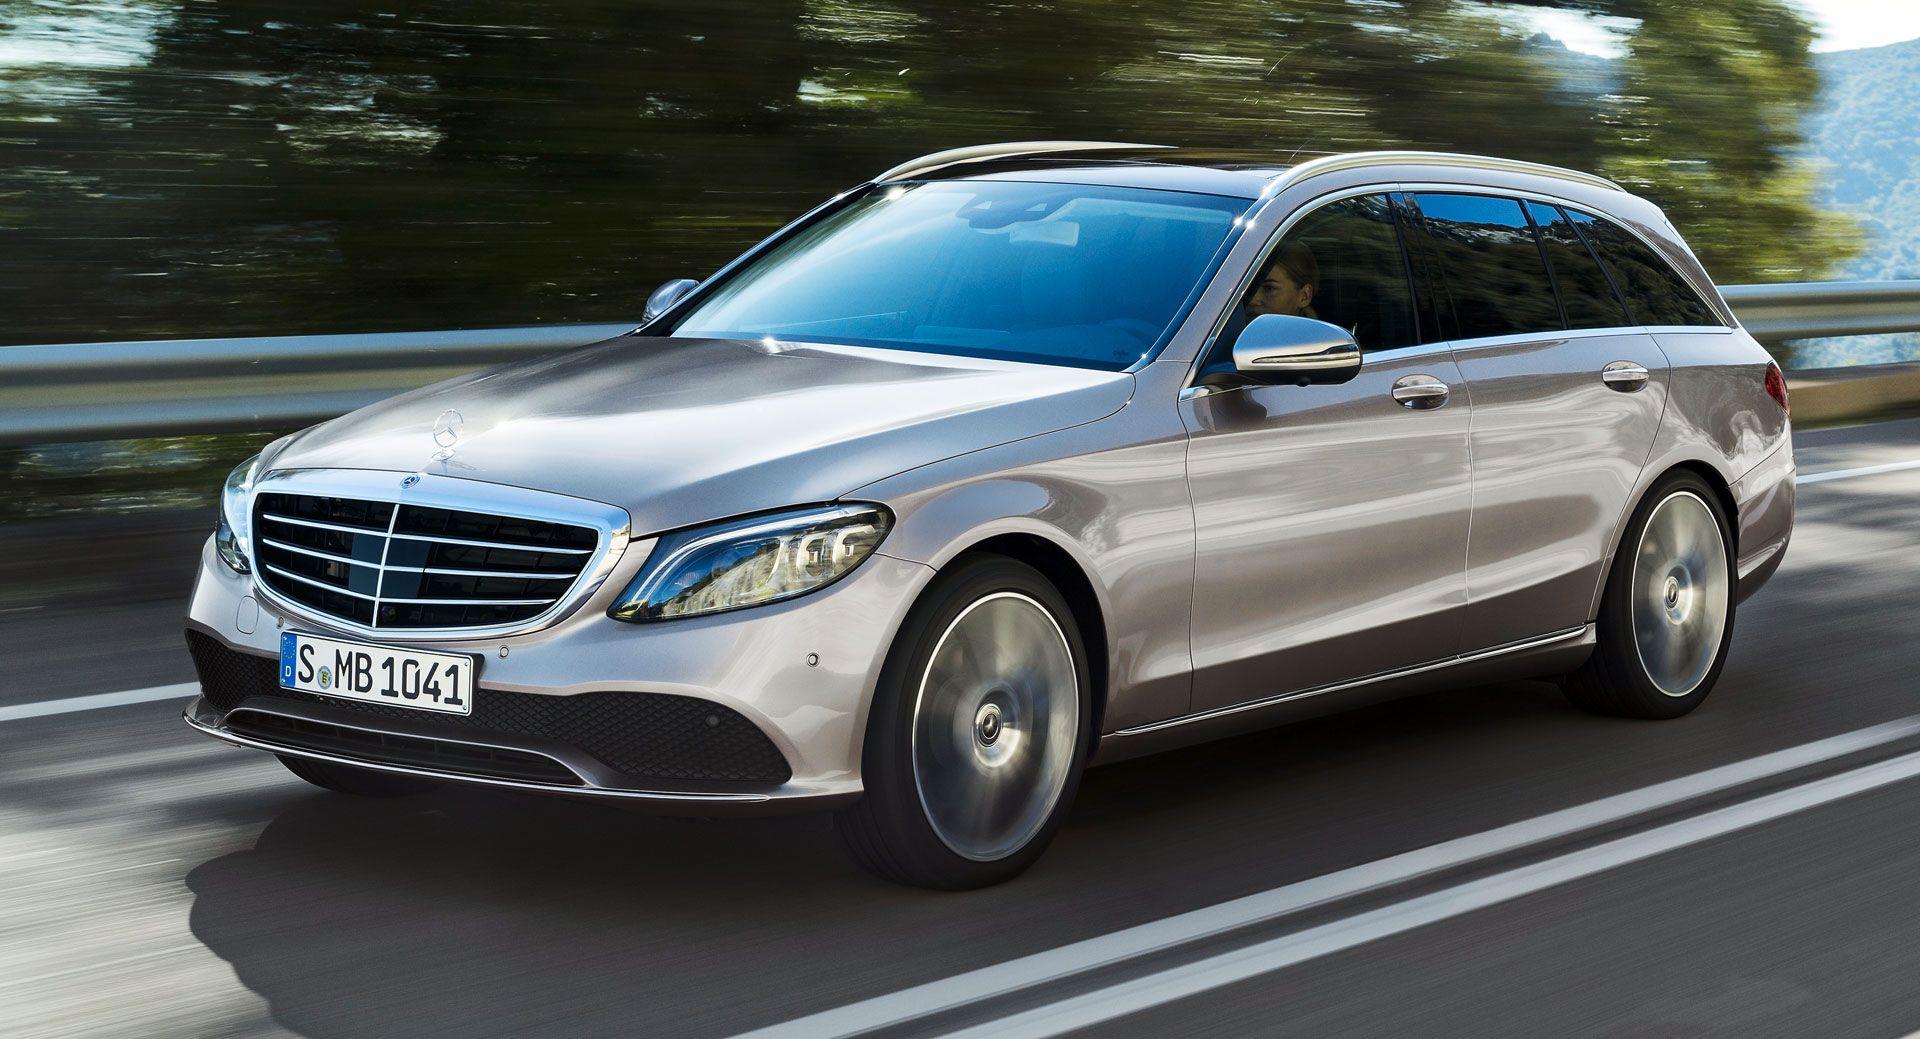 2019 Mercedes Benz C Class Facelift Debuts With S Class Tech